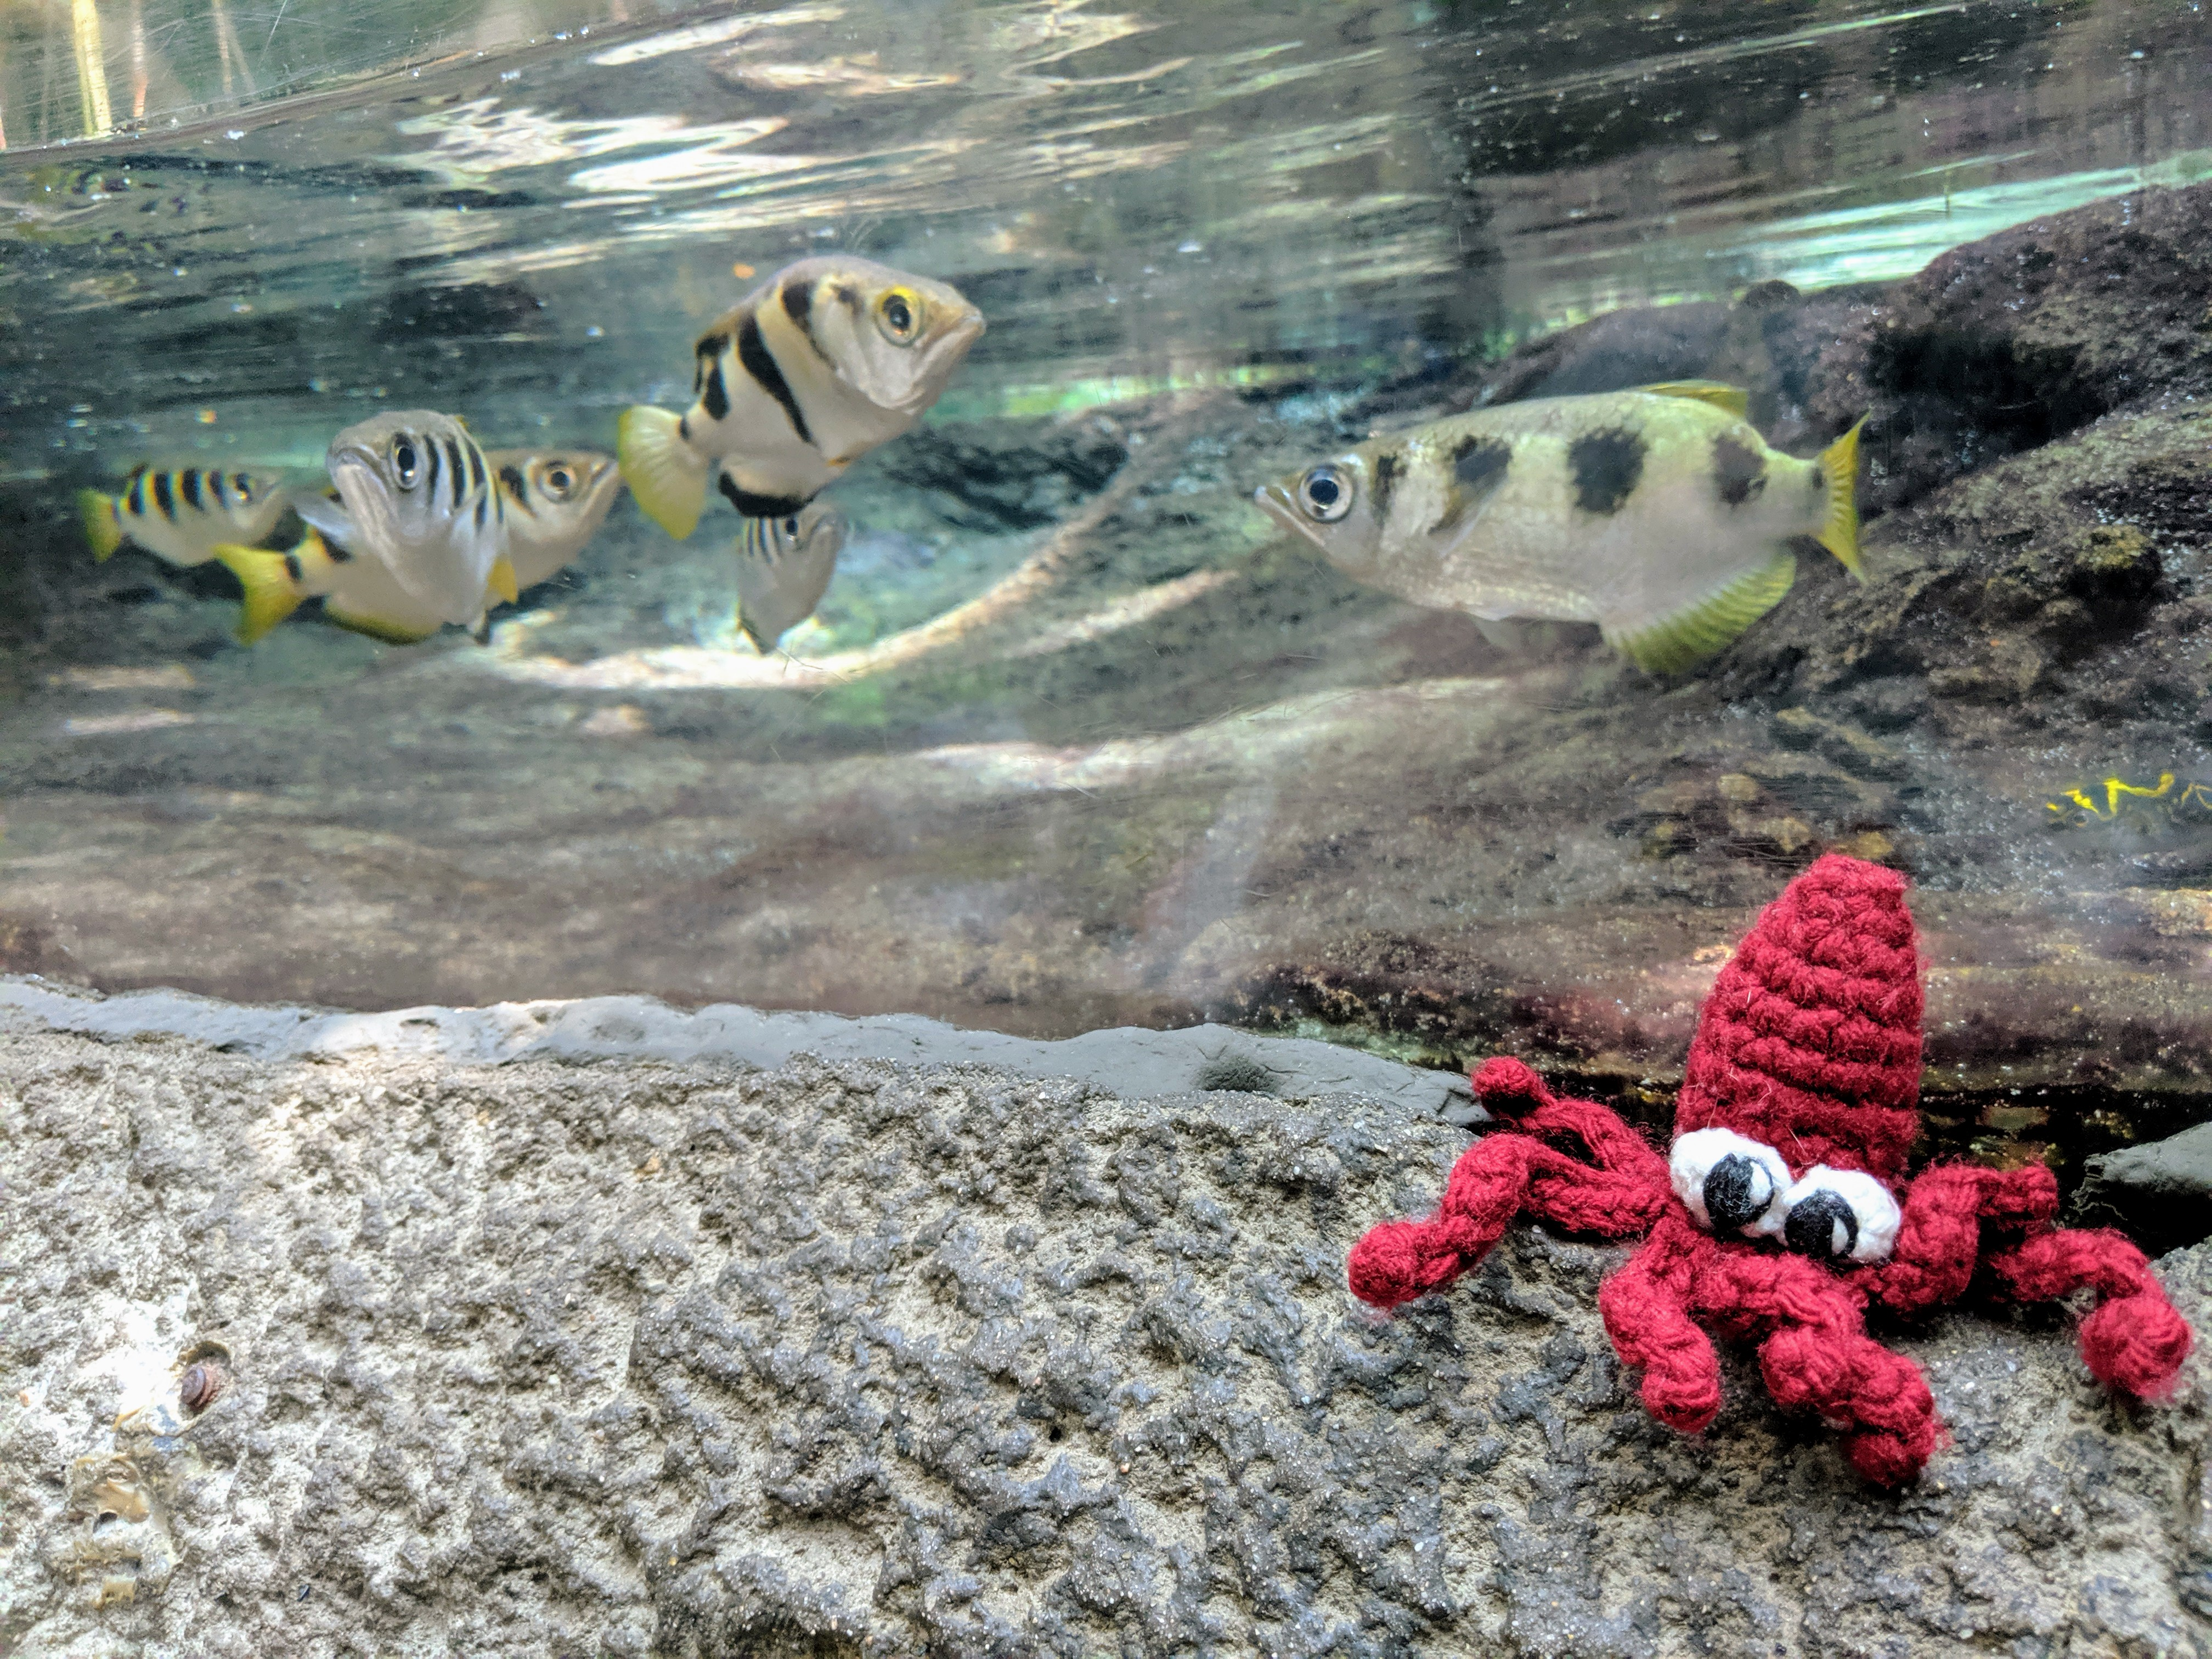 Squid Finger Puppet Goes On Amazing Adventures